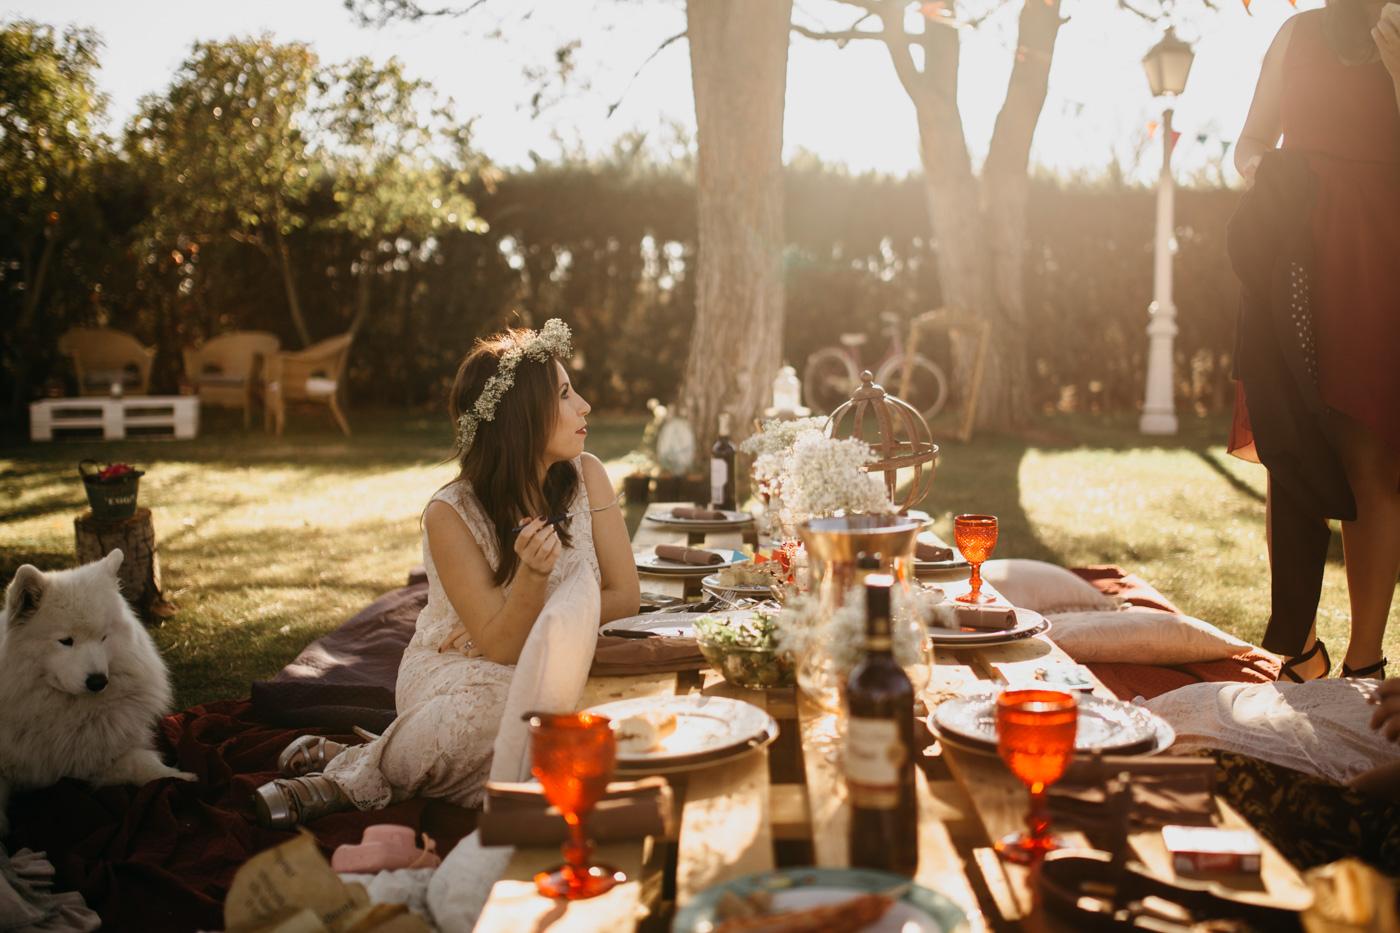 Velvet-Hush-fotografos-boda-al-aire-libre-madrid-063